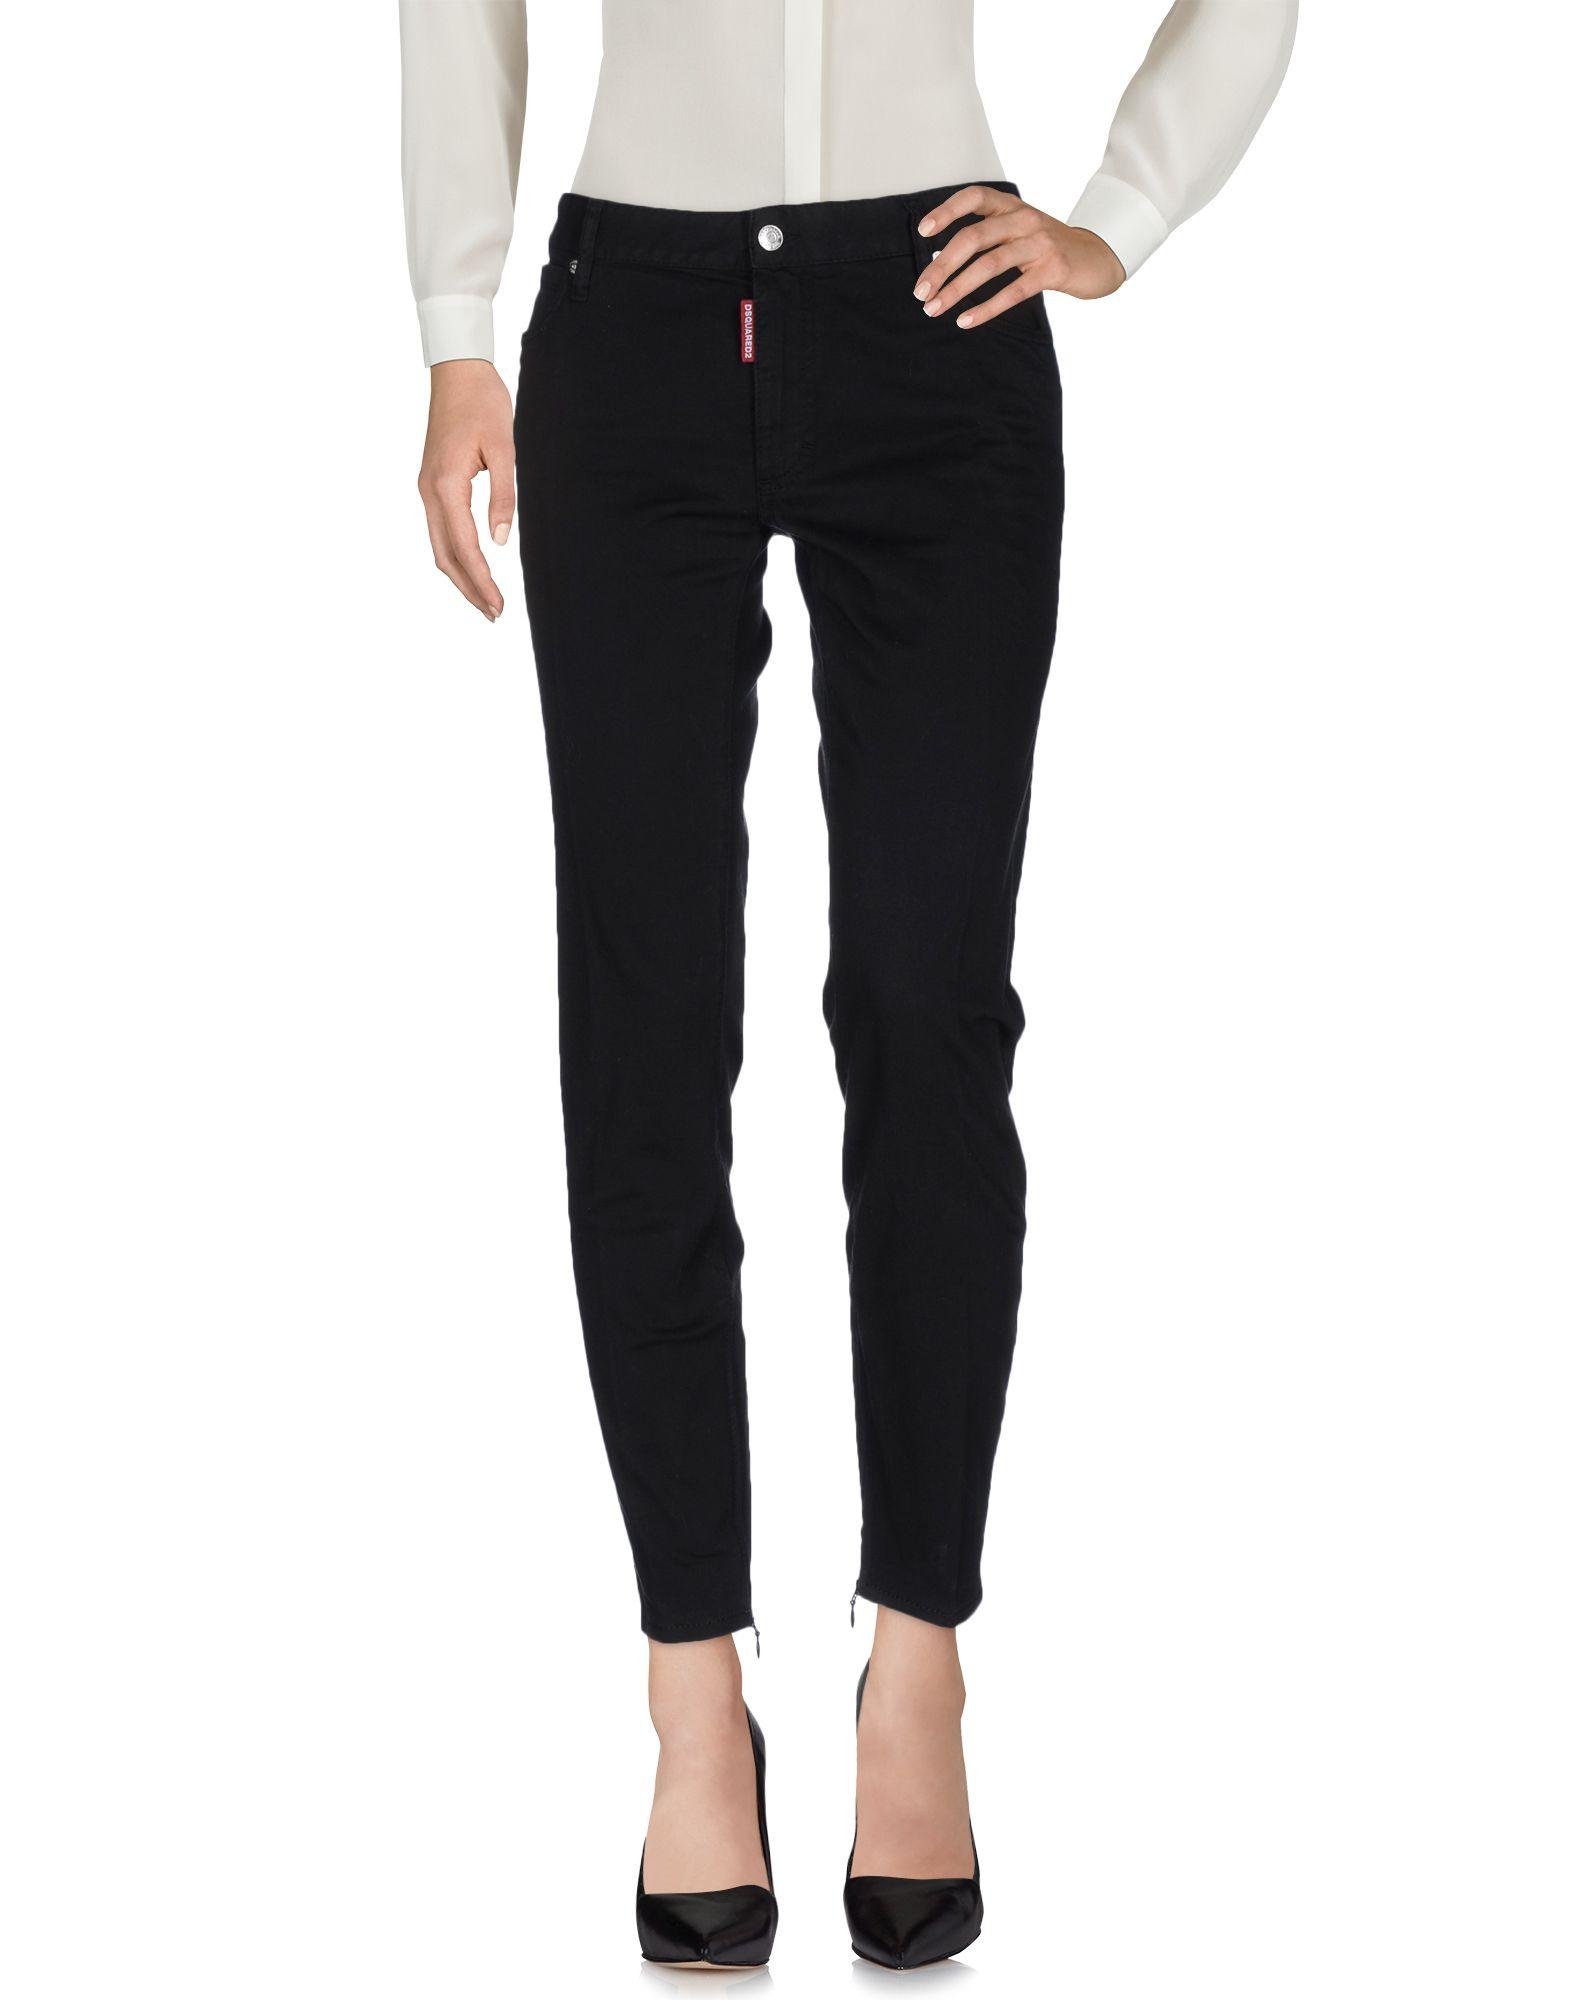 DSQUARED2 Damen Hose Farbe Schwarz Größe 6